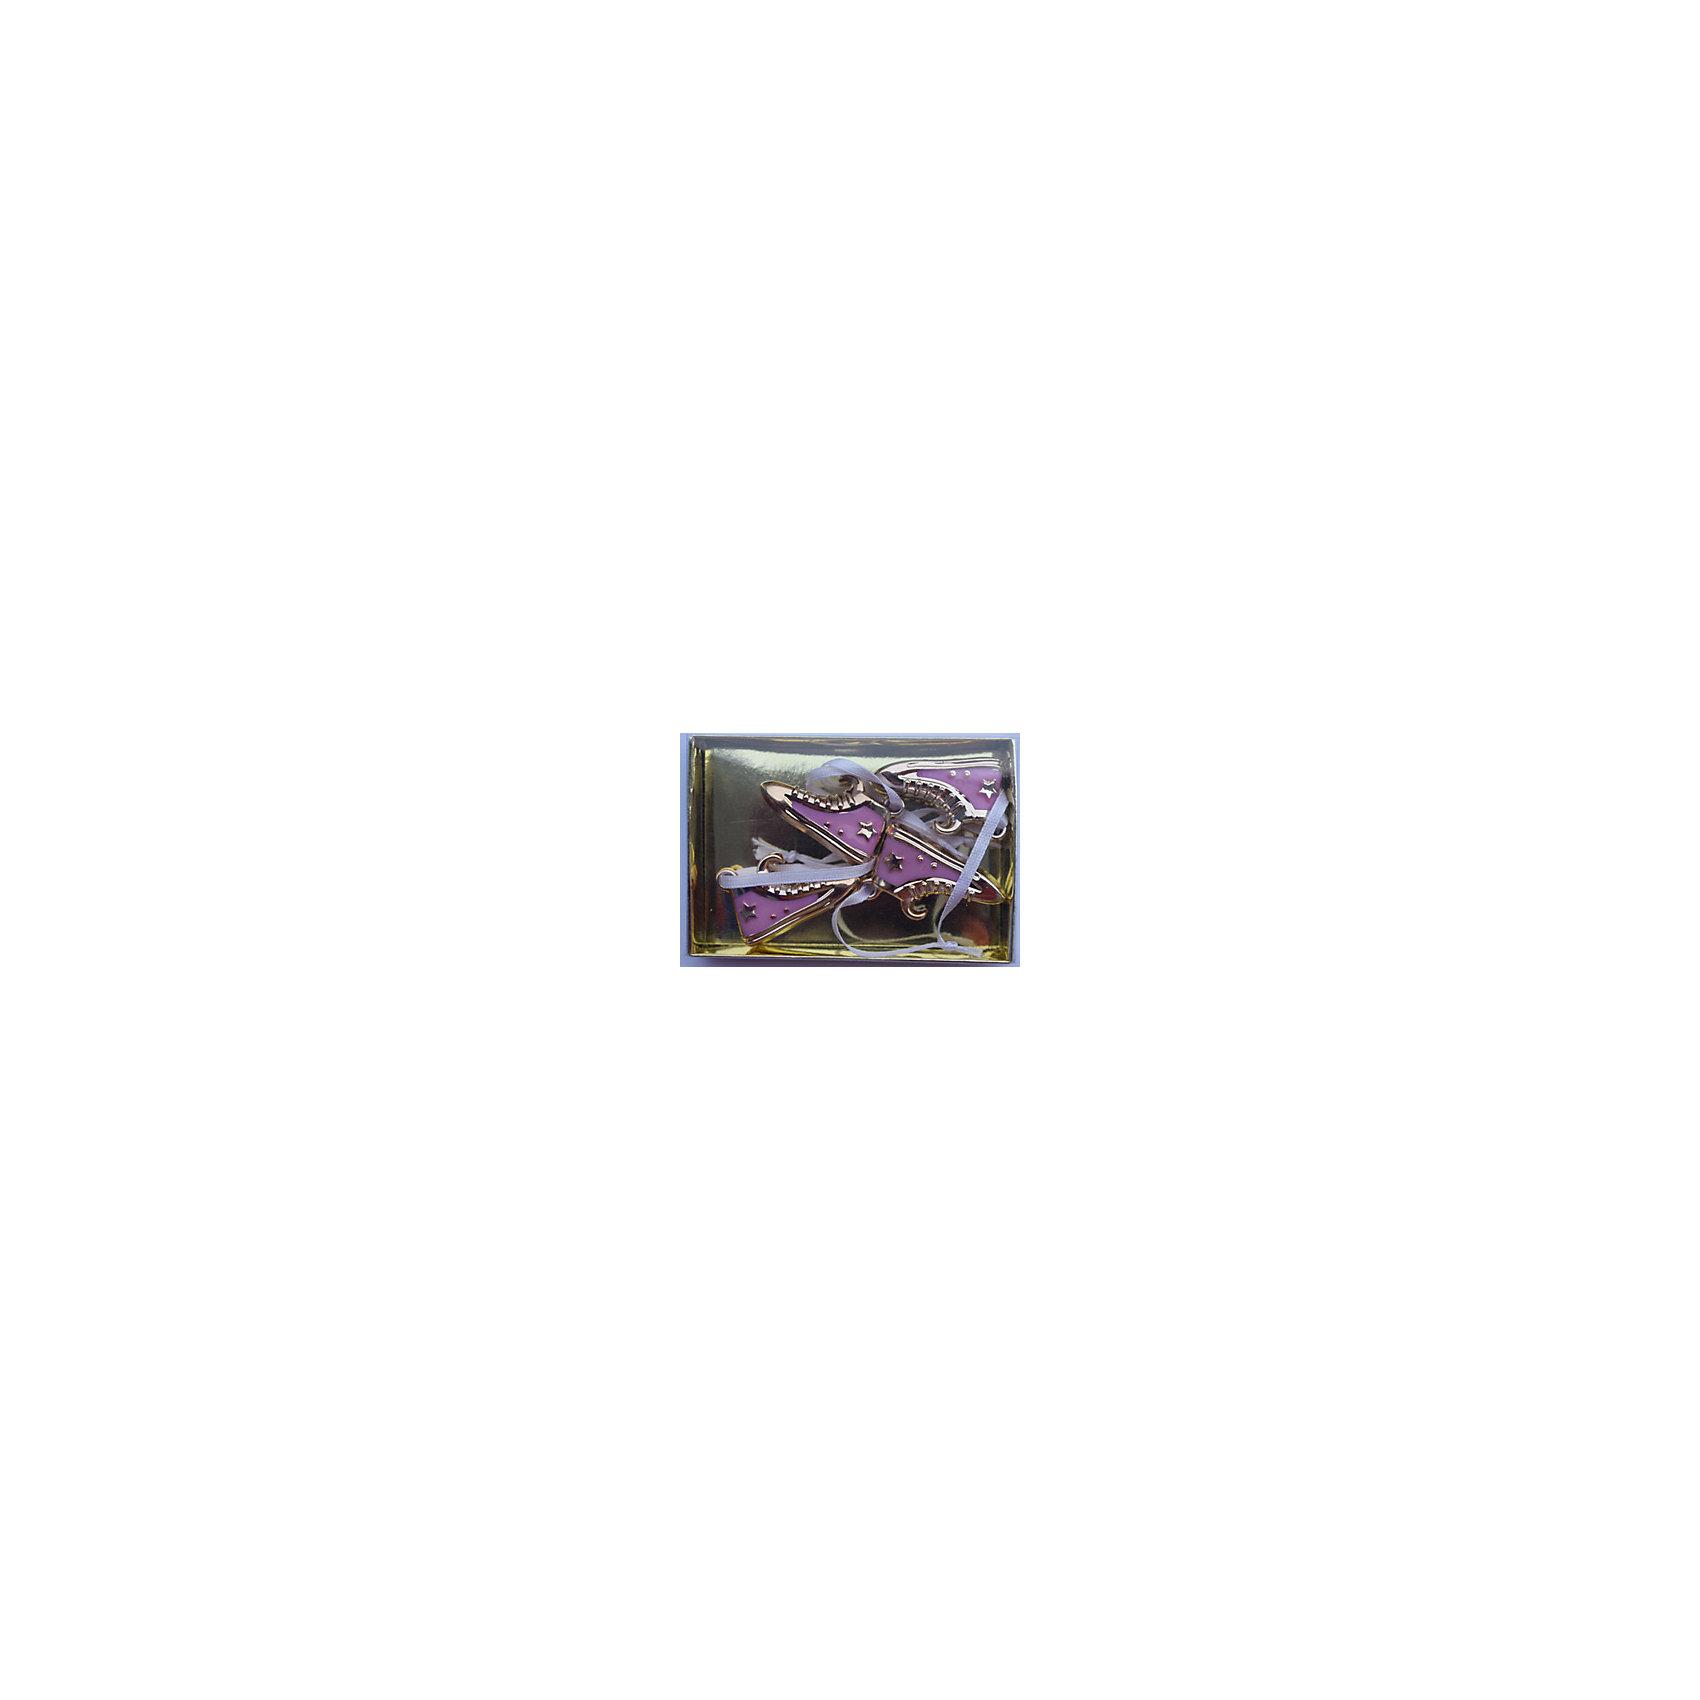 Magic Time Набор украшений Розовые кеды 4 шт magic time набор украшений королевские ключи 2 шт